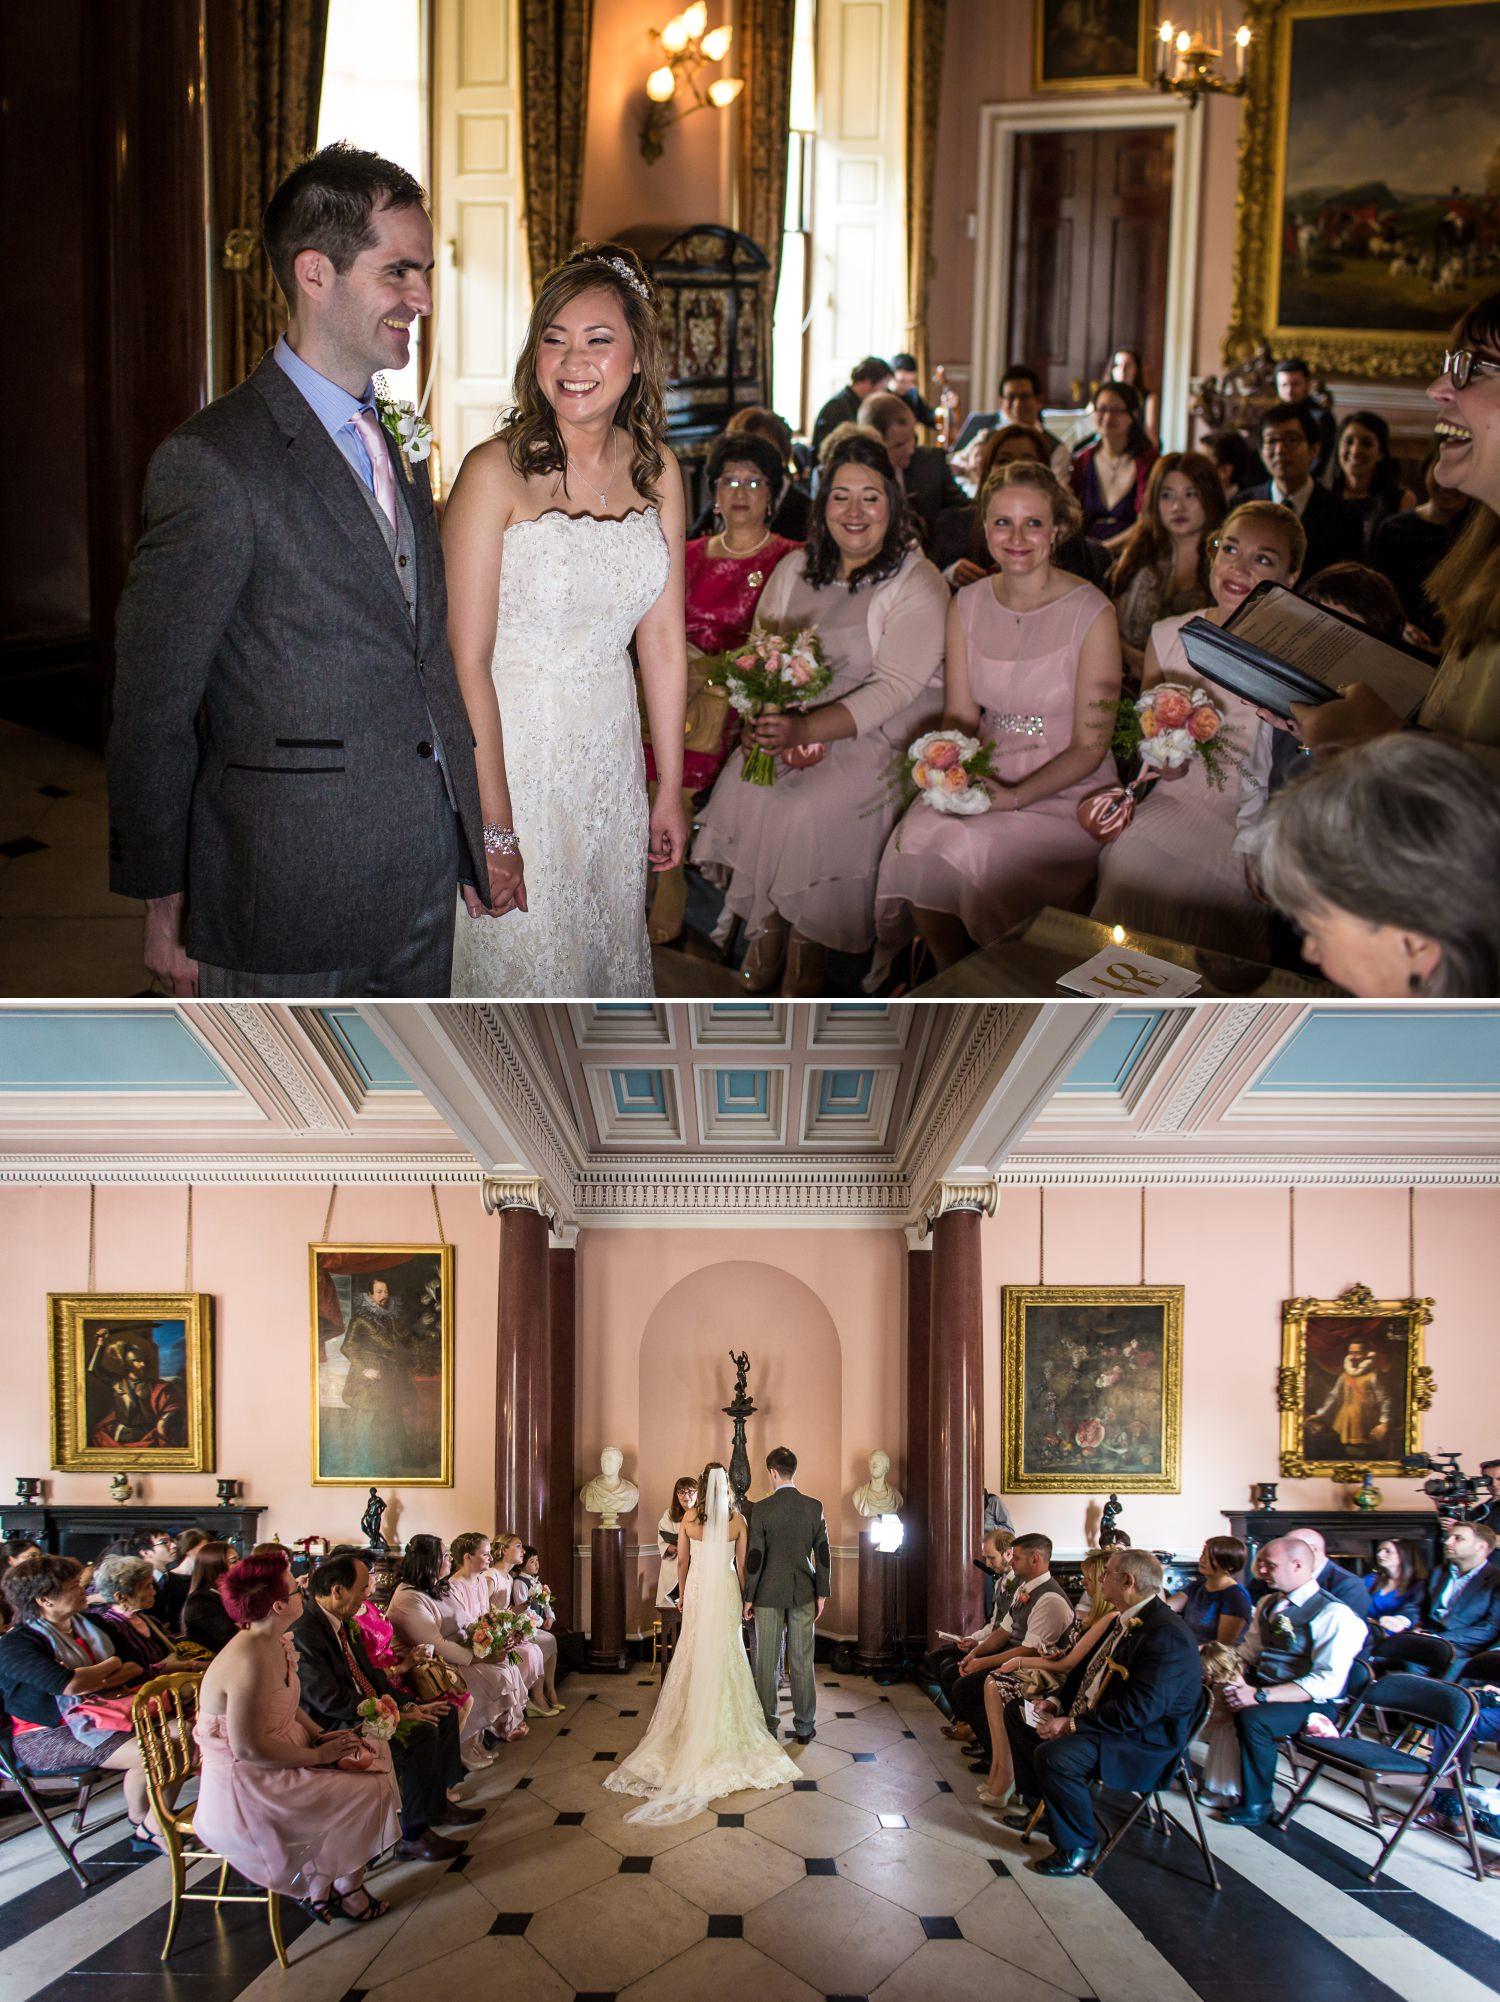 Wedding Photograph of wedding ceremony in Tatton Park